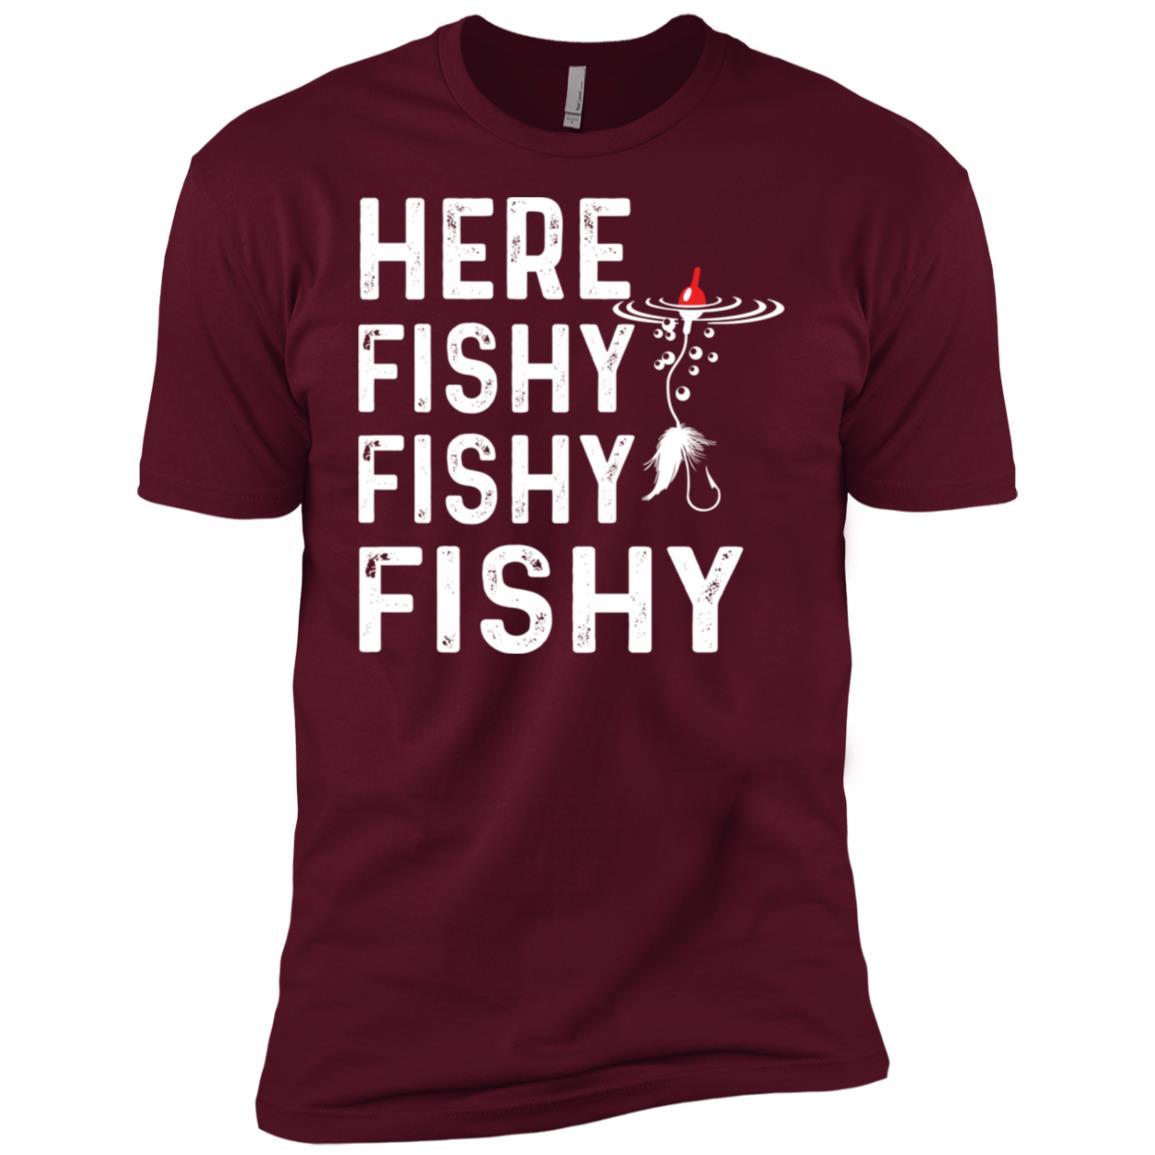 Here Fishy Fishy Fishy Funny Fisherman Tee Men Short Sleeve T-Shirt